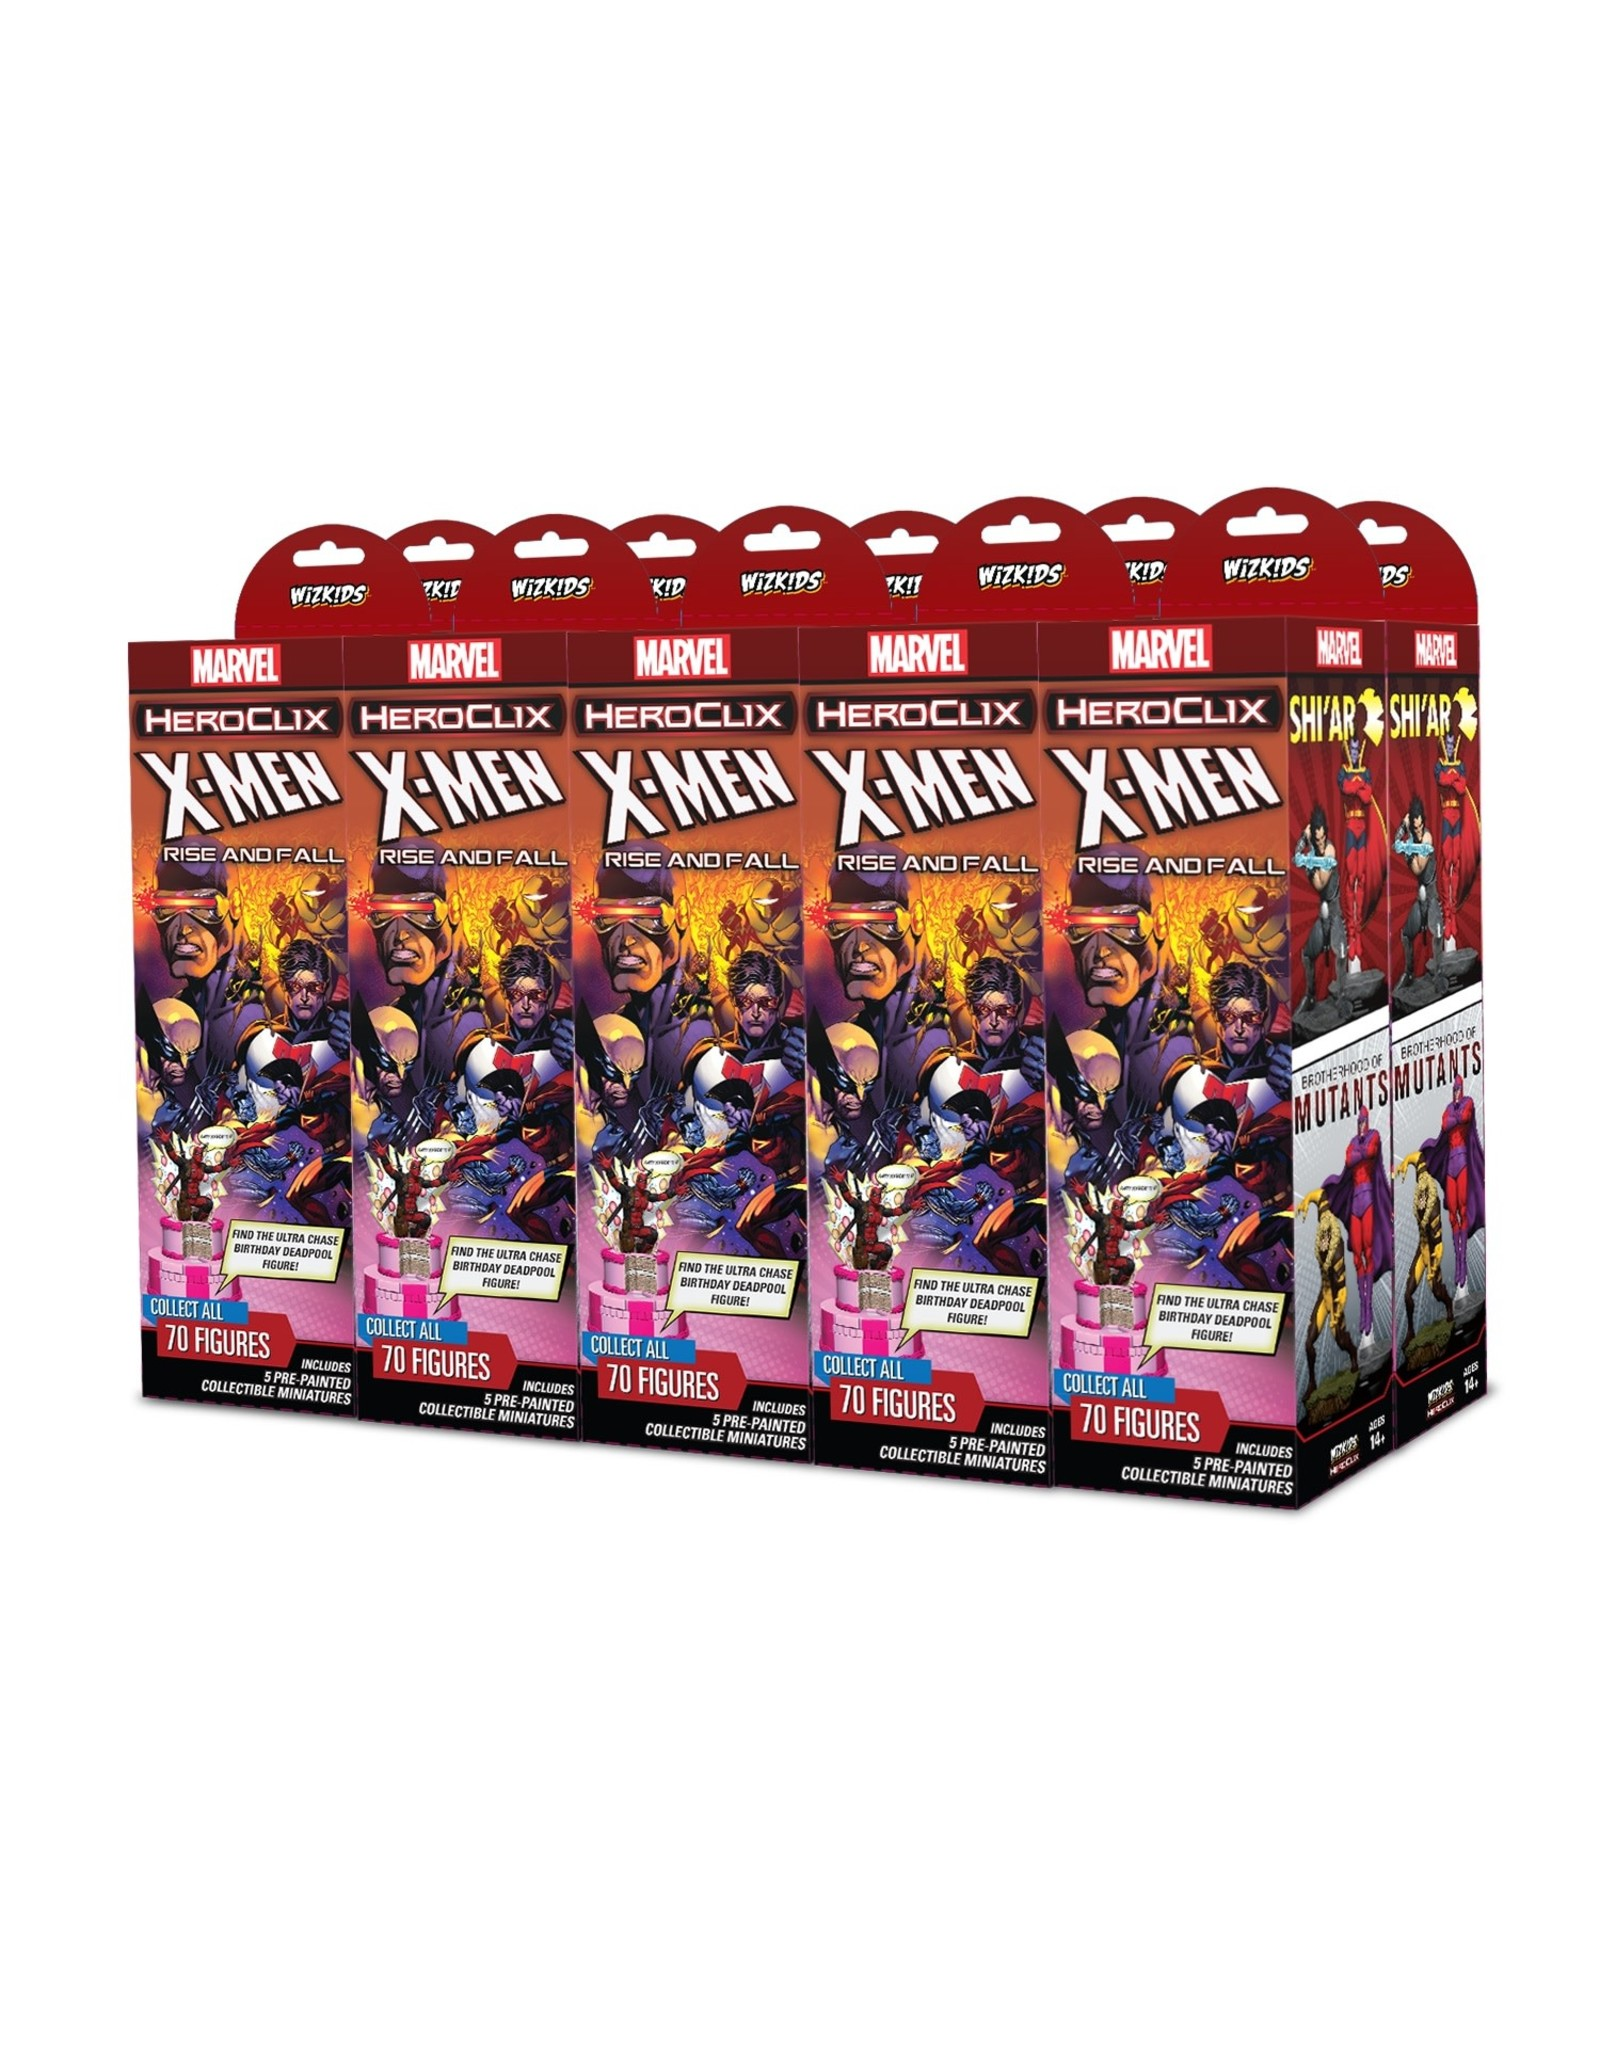 WizKids Marvel HeroClix: X-Men Rise and Fall Booster Brick